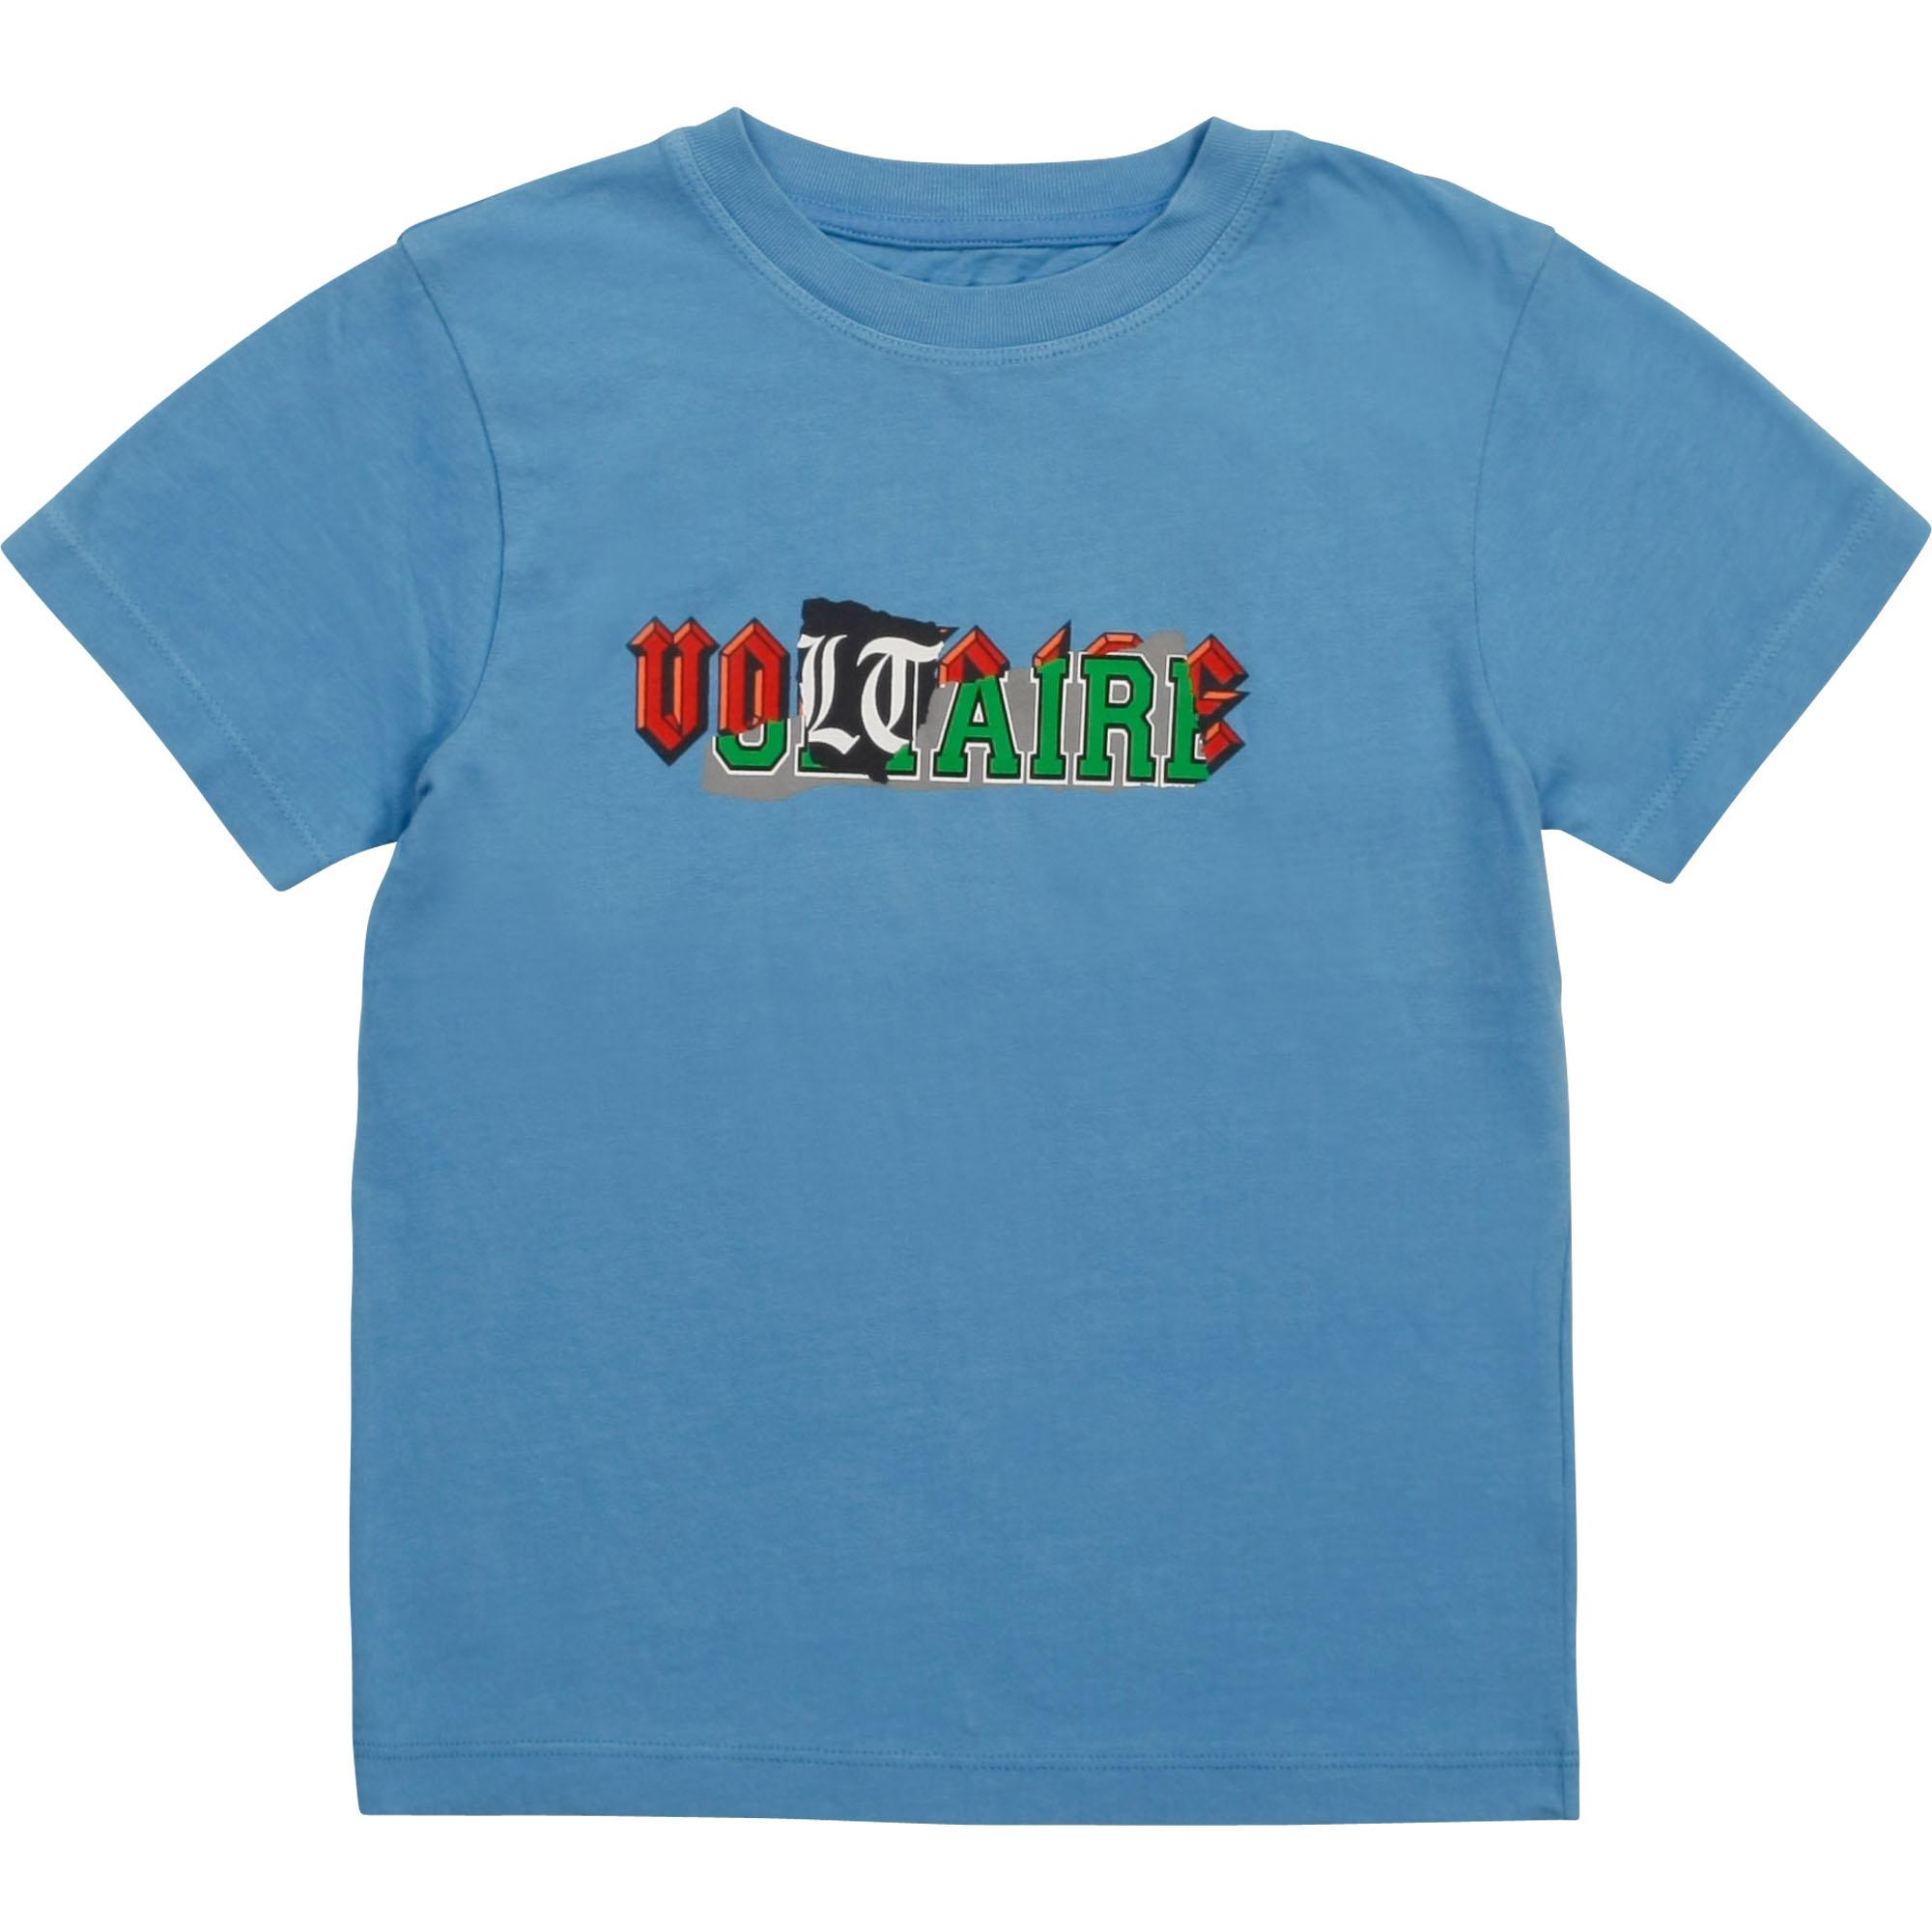 ZADIG & VOLTAIRE t shirt en jersey de coton-1